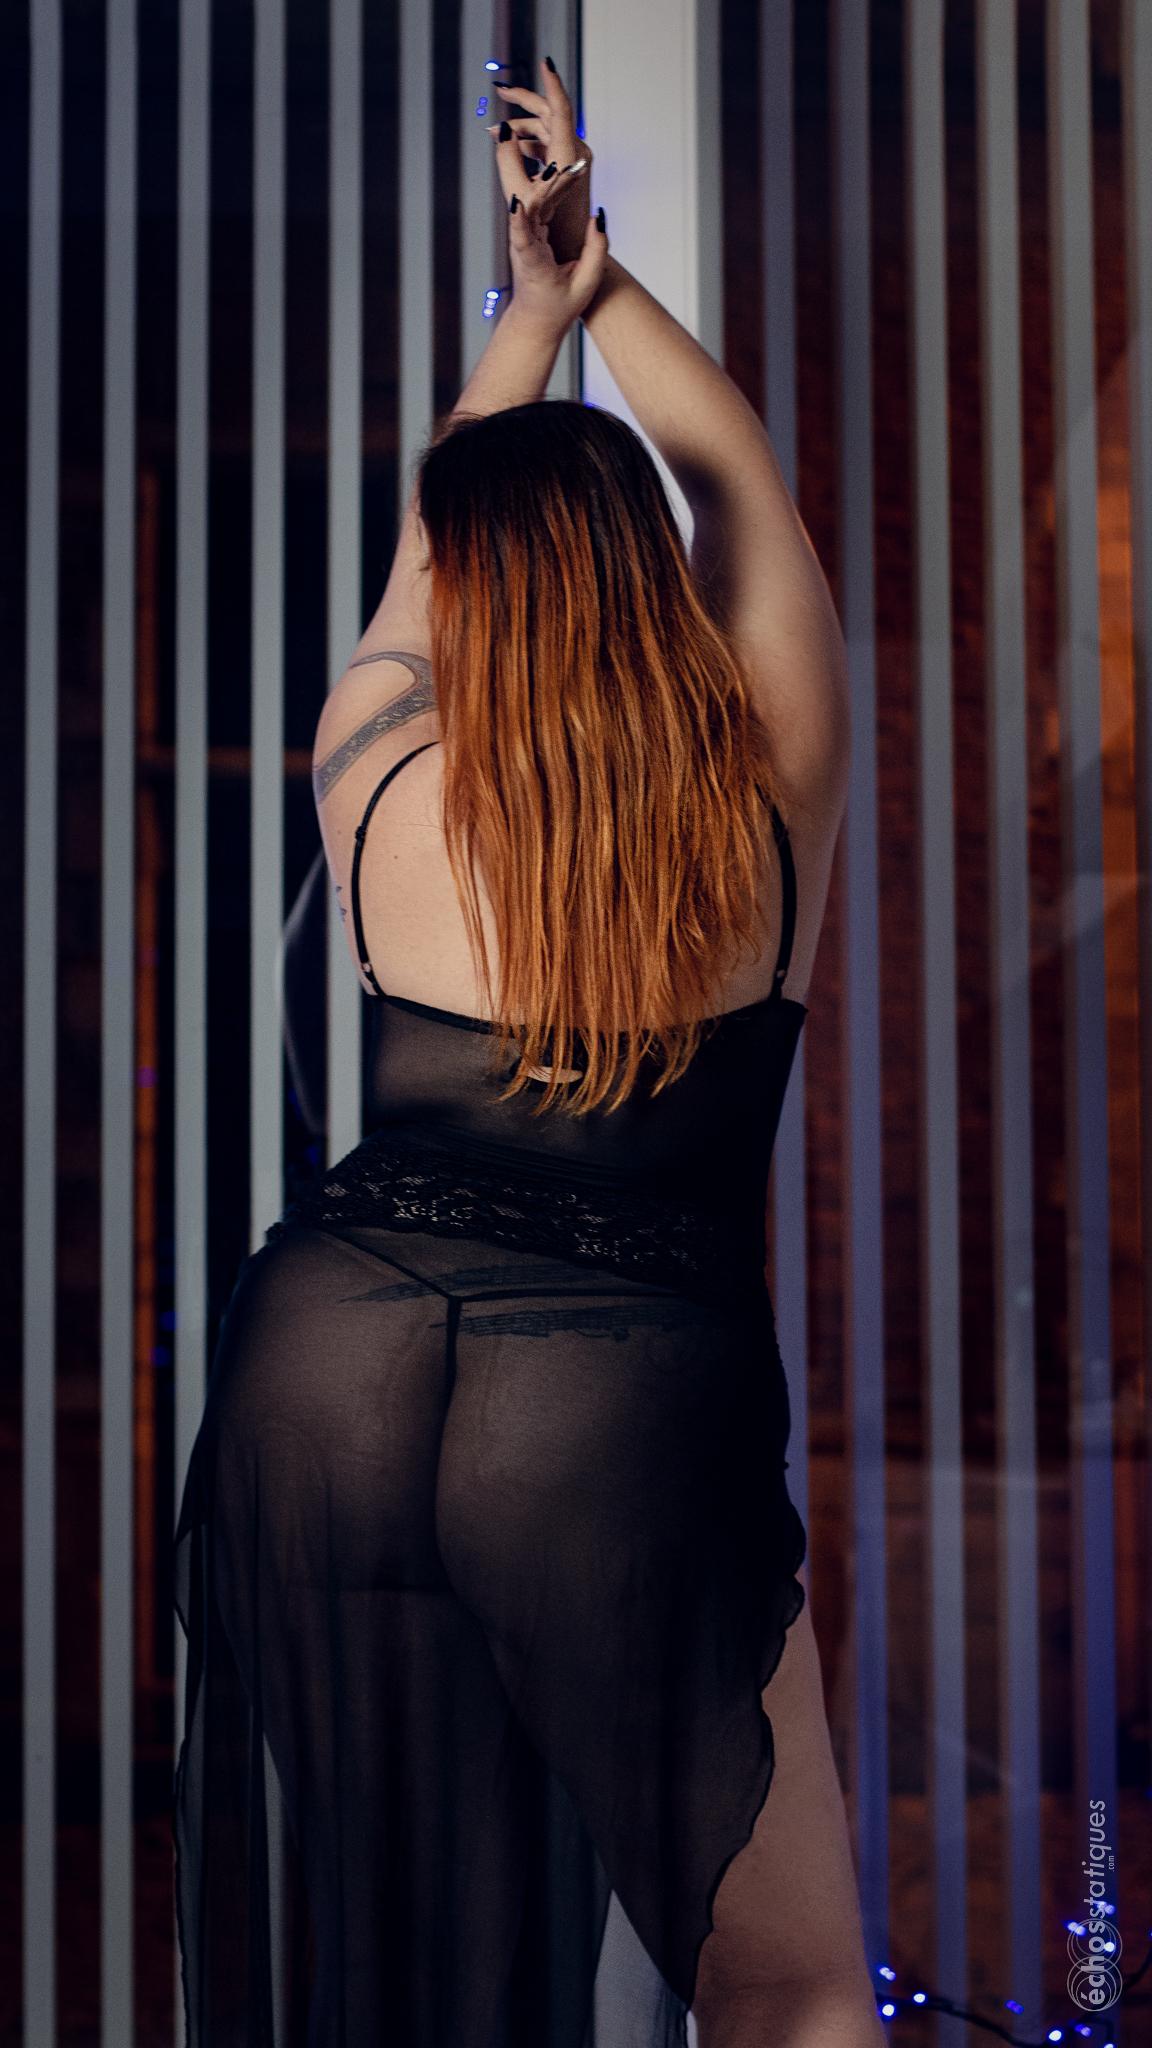 blog-lingerie-grande-taille-nuisette-sexy-passage-du-desir-dos